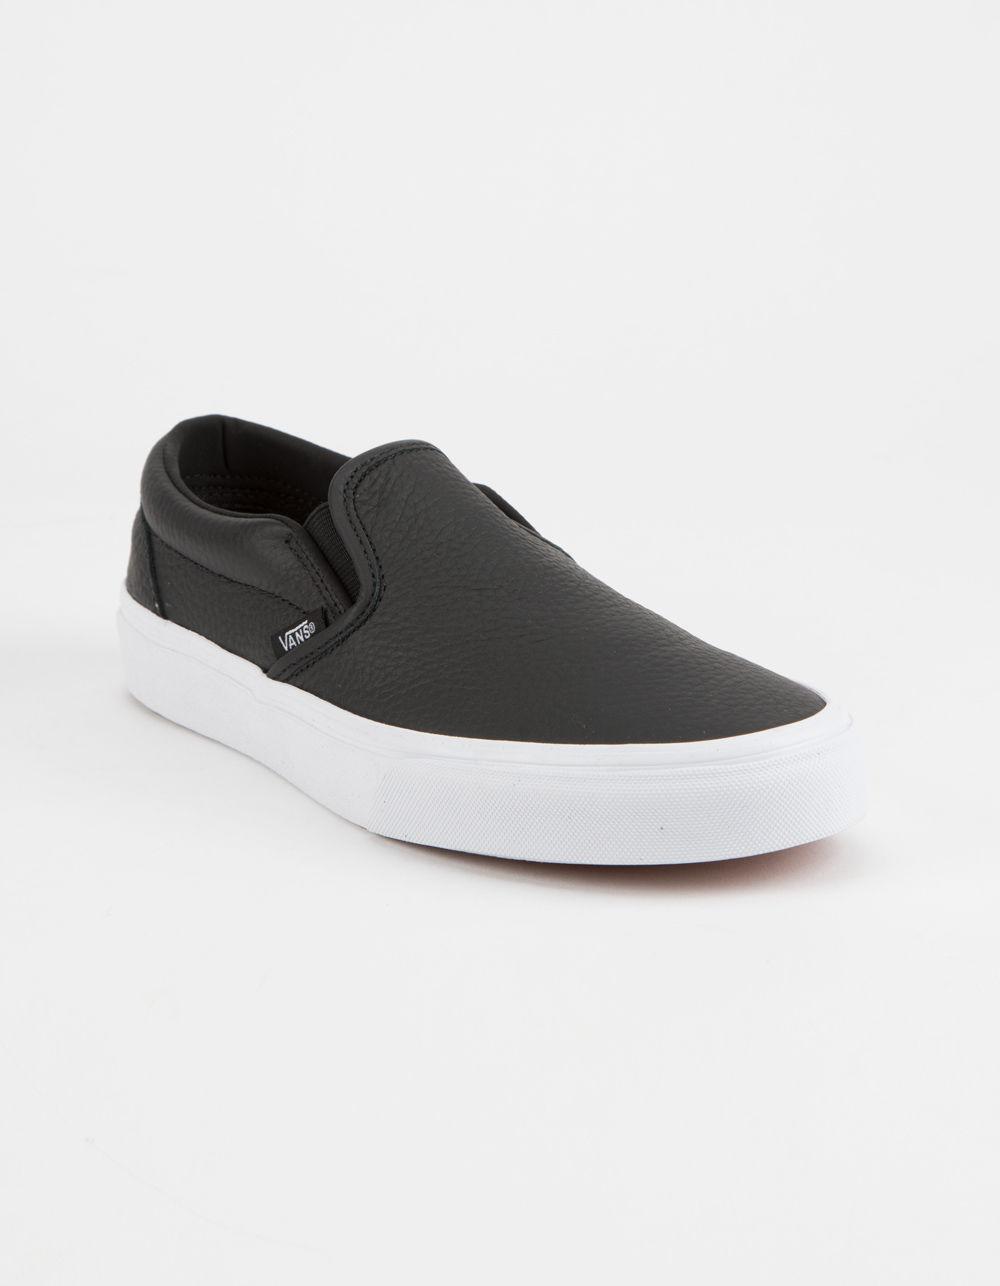 d41d06e48799 Lyst - Vans Tumble Leather Black   True White Classic Slip-on Womens Shoes  in Black